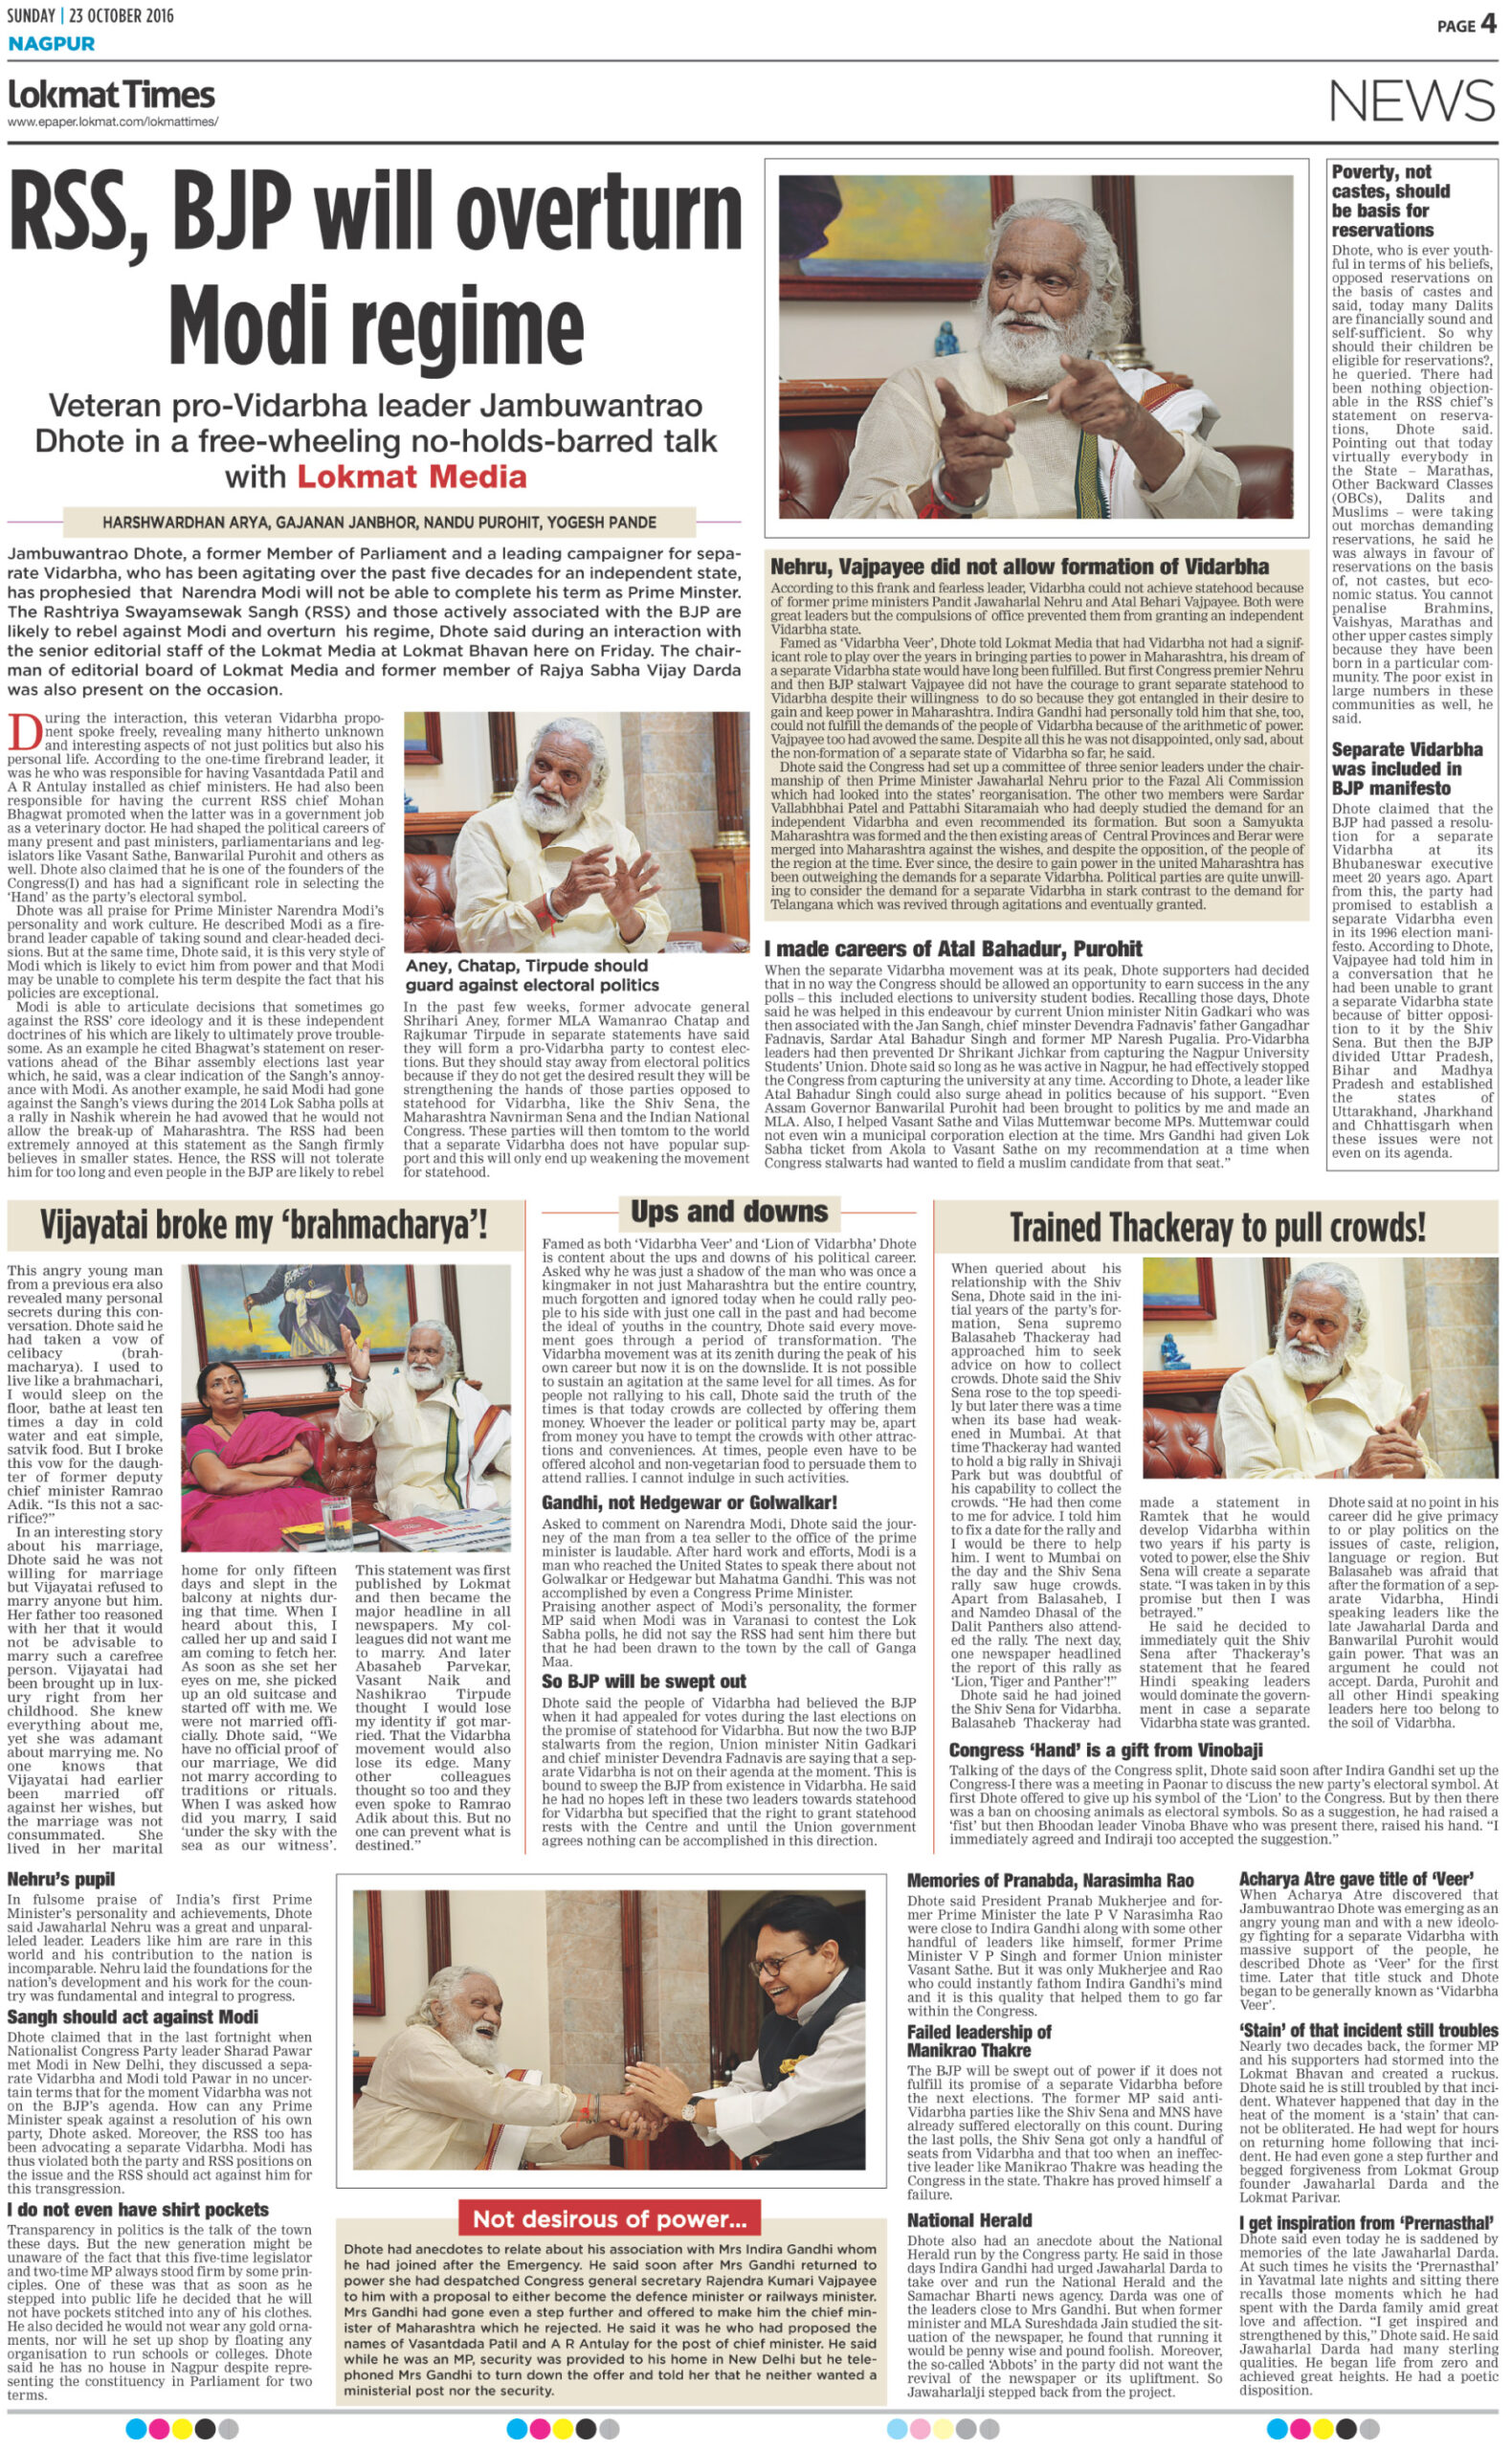 RSS, BJP will overturn Modi regime